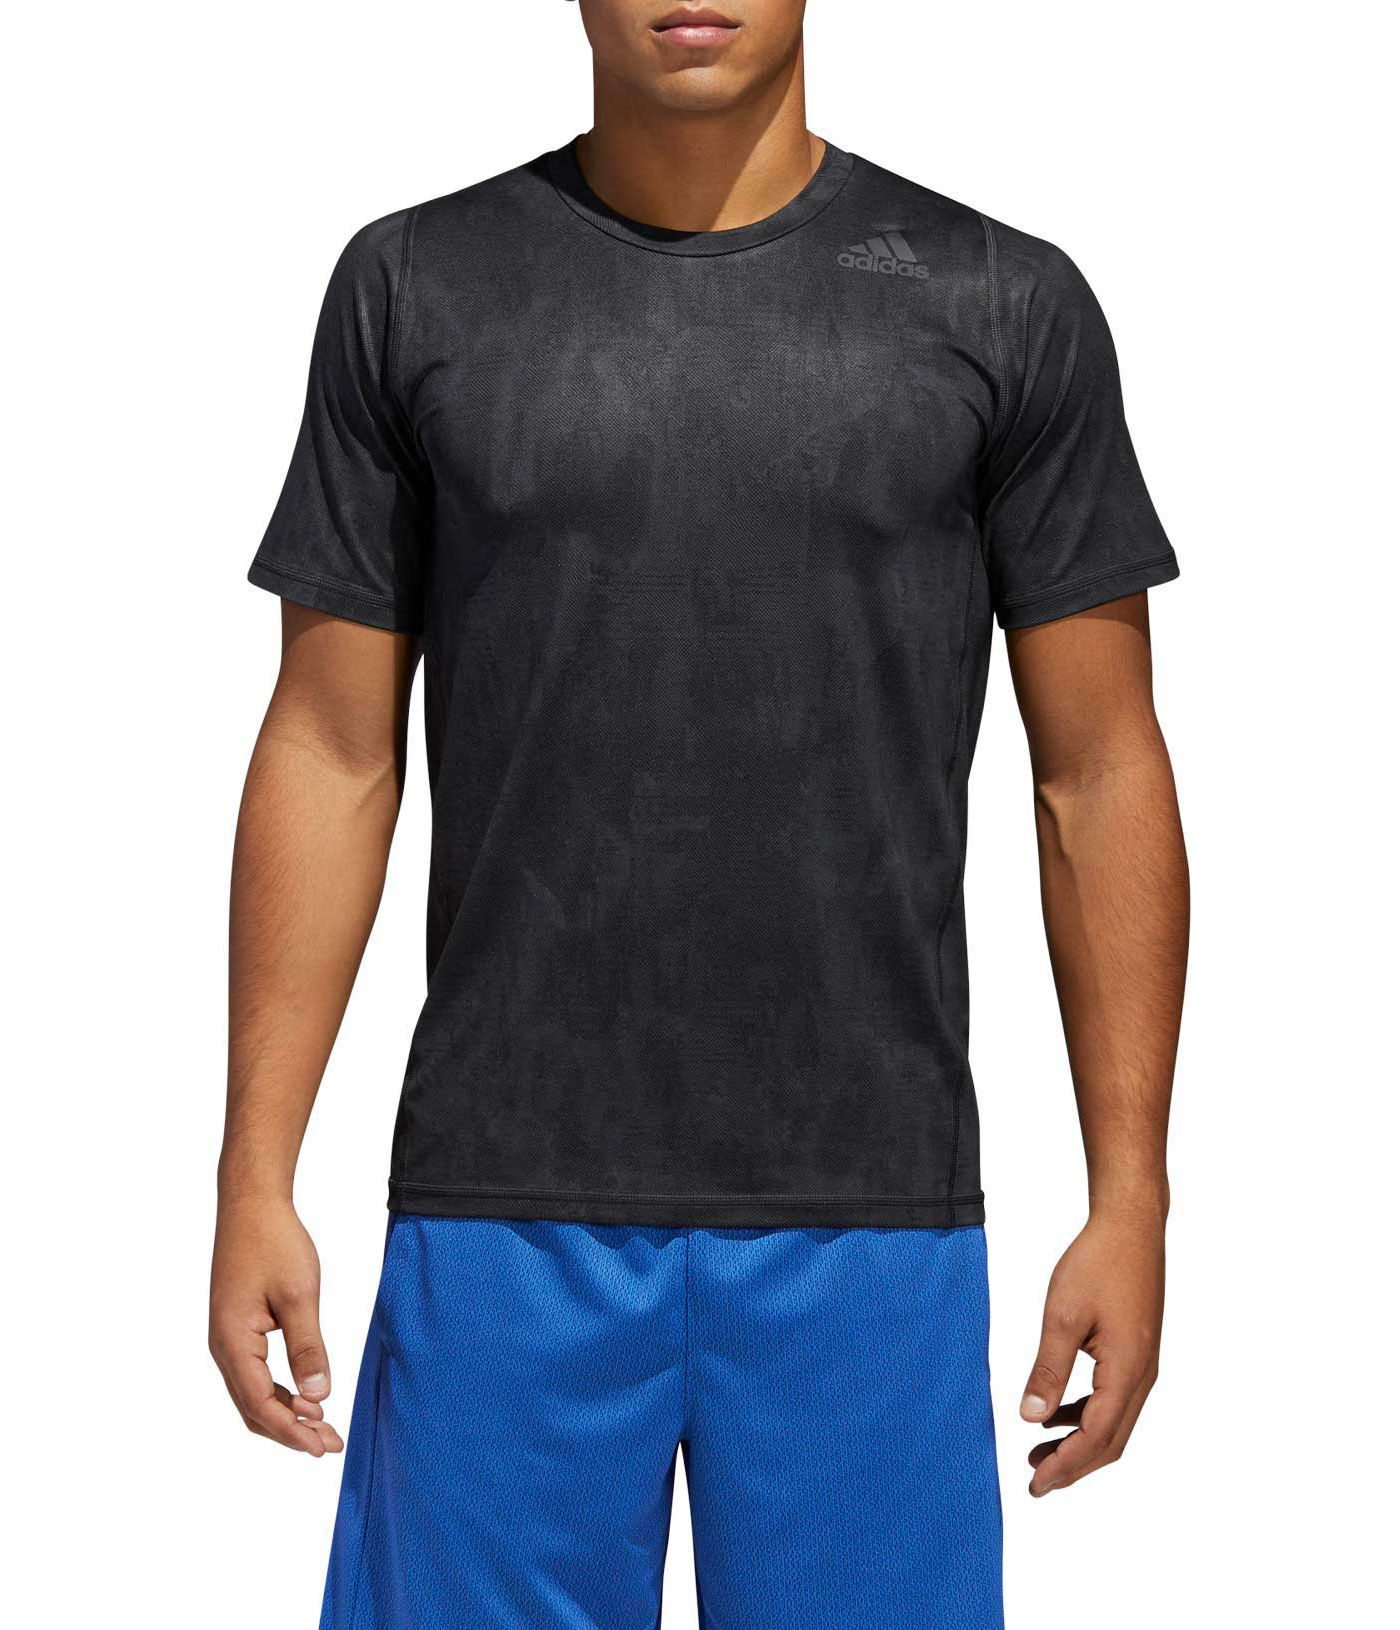 adidas Men's Alphaskin Sport Printed Training T-Shirt